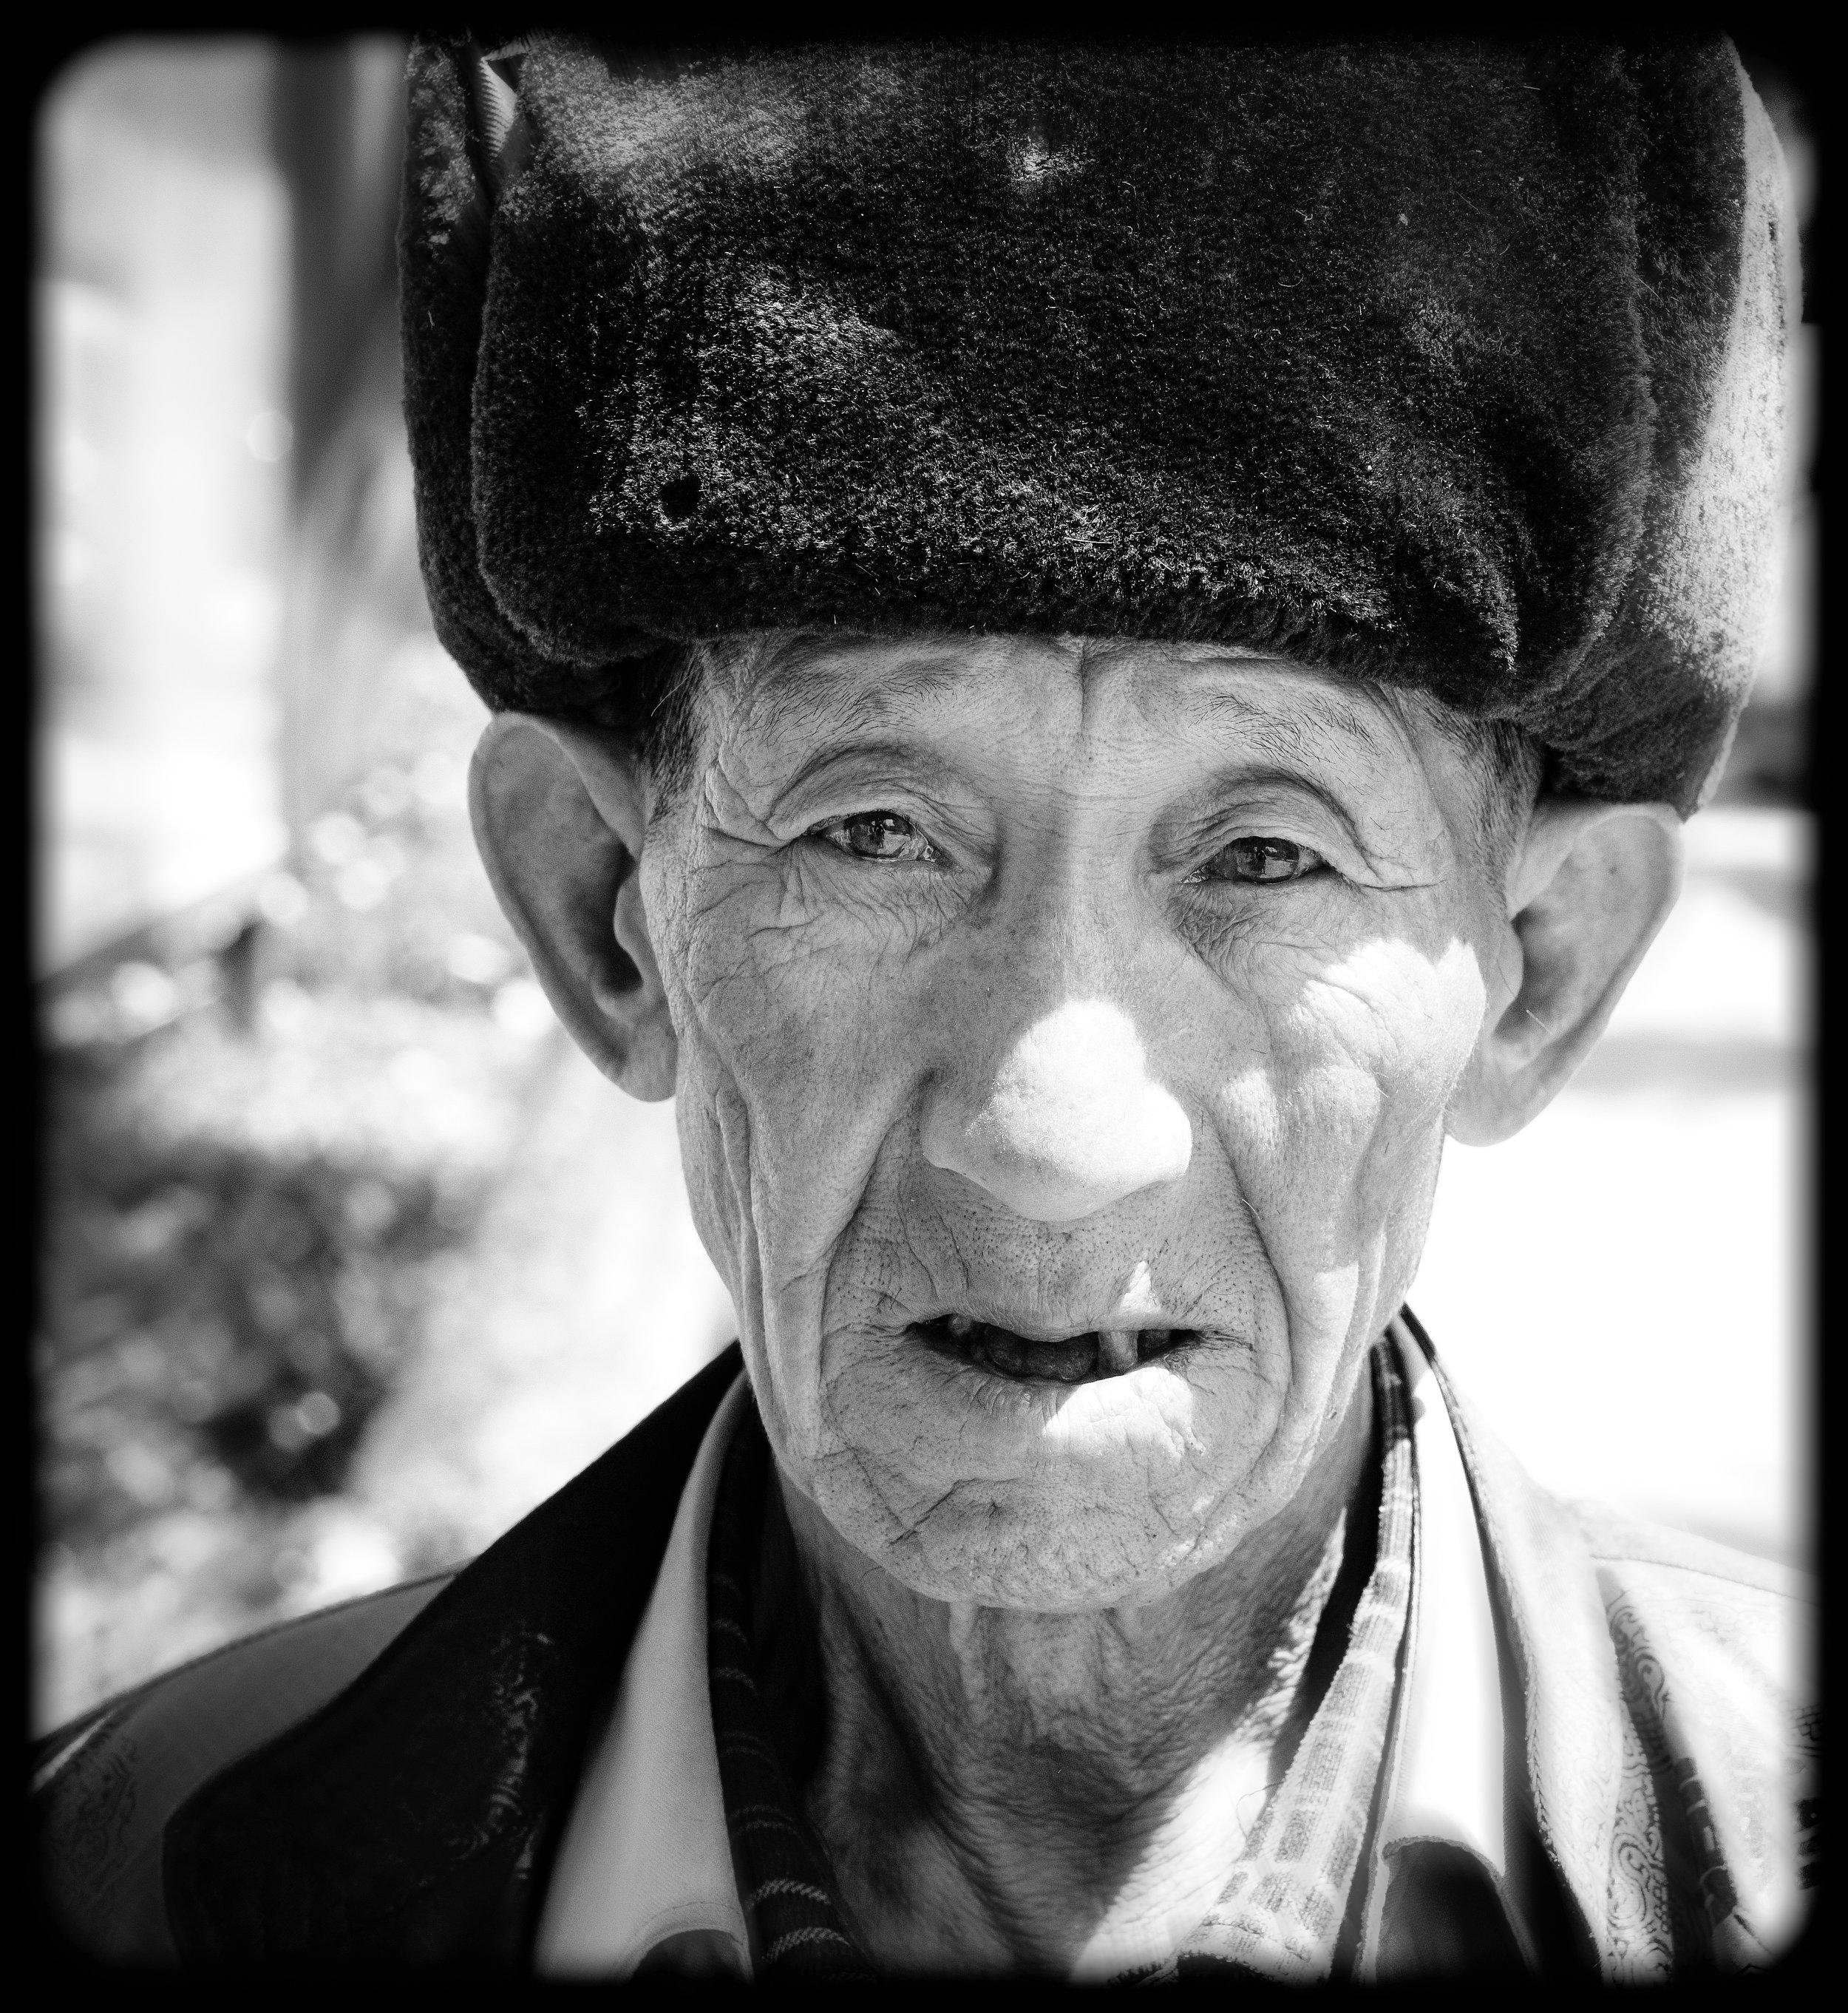 older man in hat.jpg